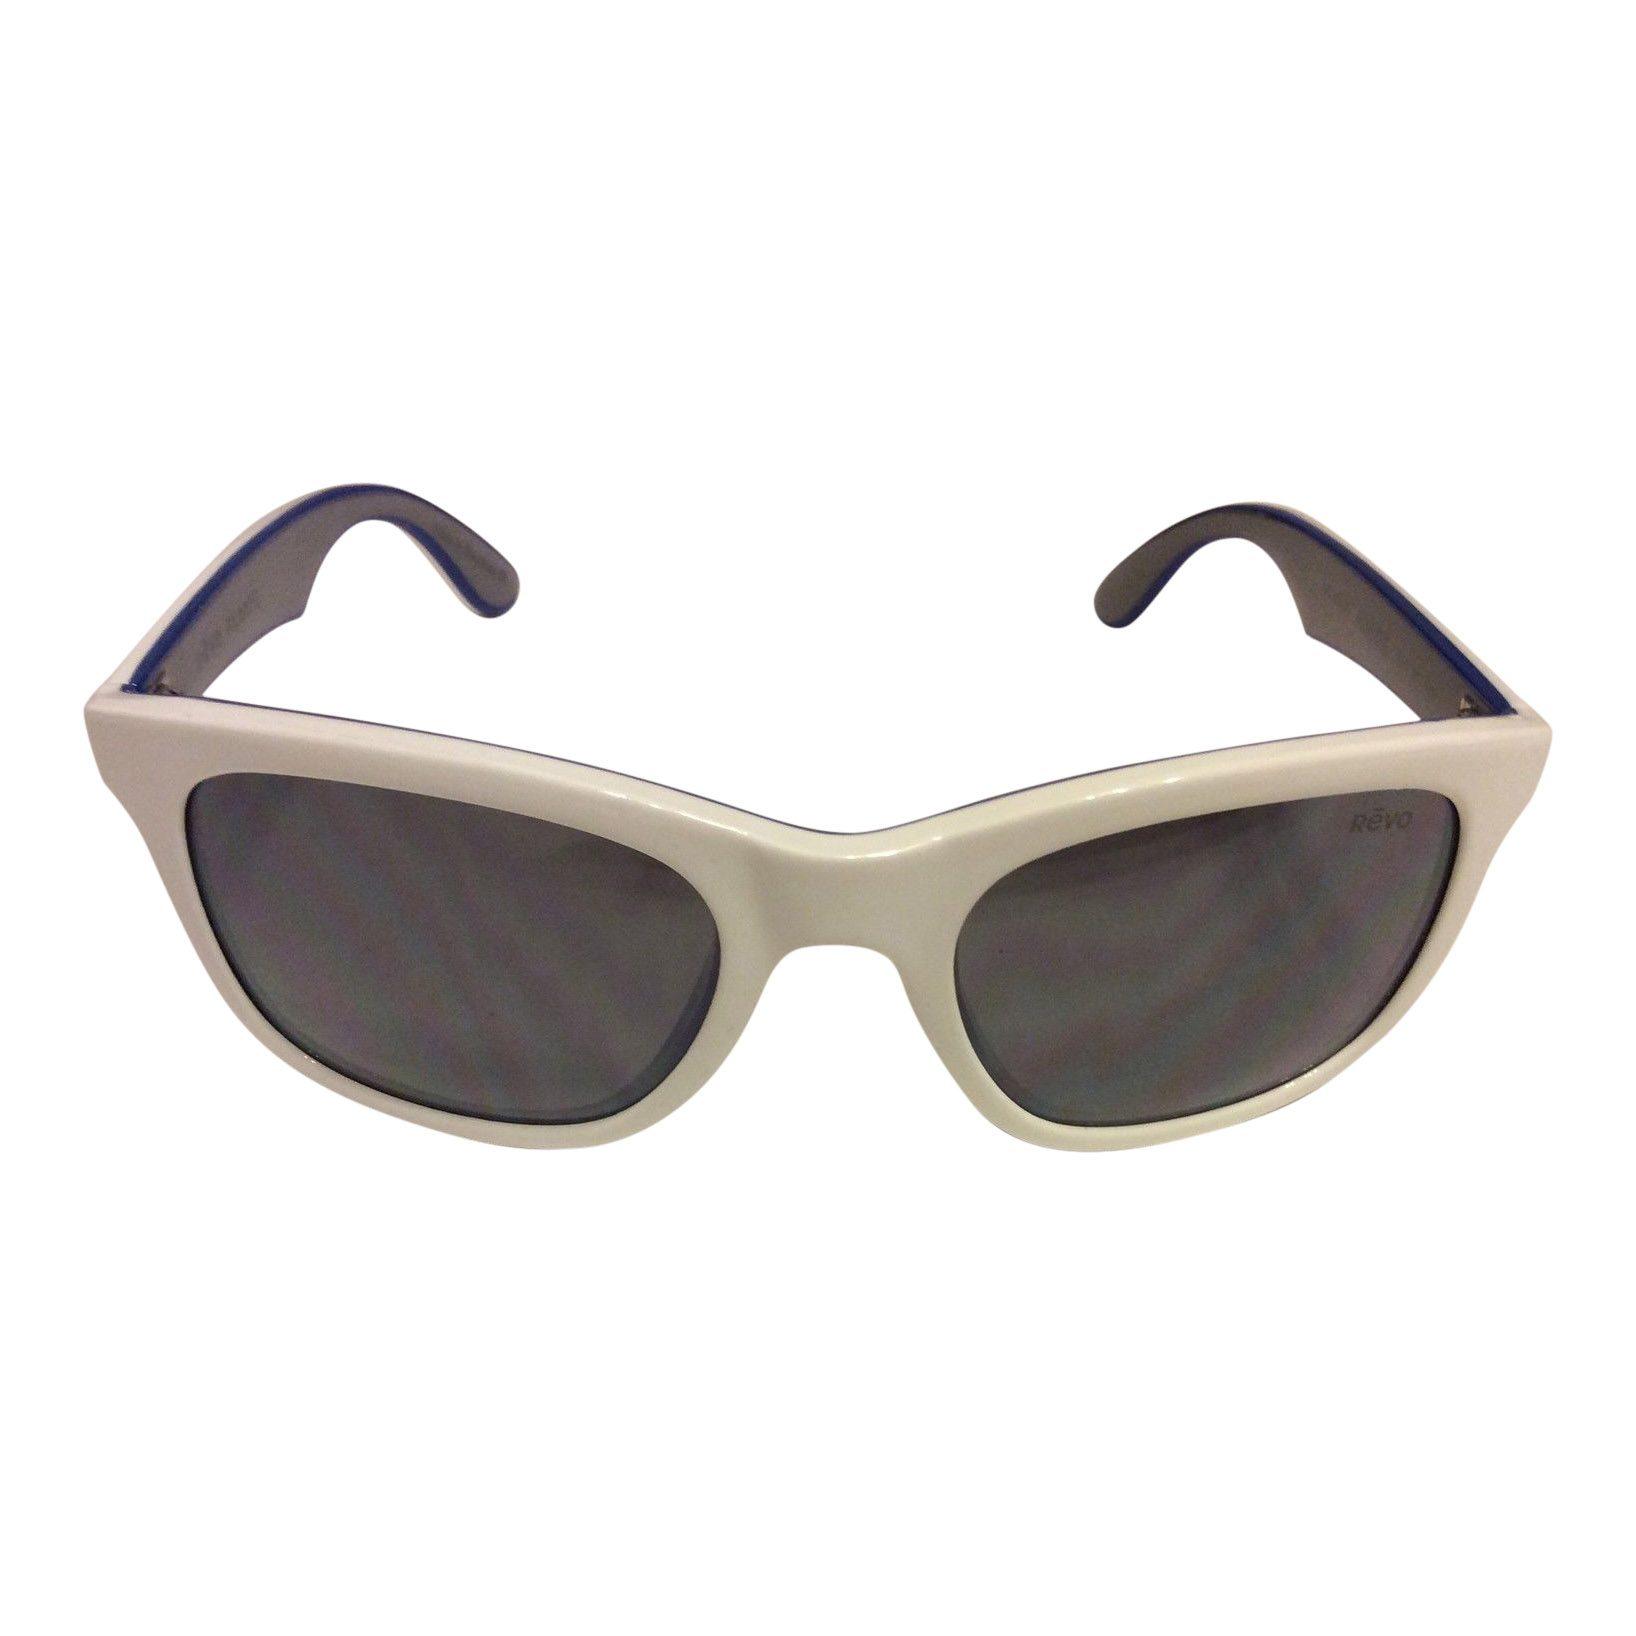 e40defba1d Revo Huddie Sunglasses – White Blue Frame – Polarized Gray Lens – RE1000-09